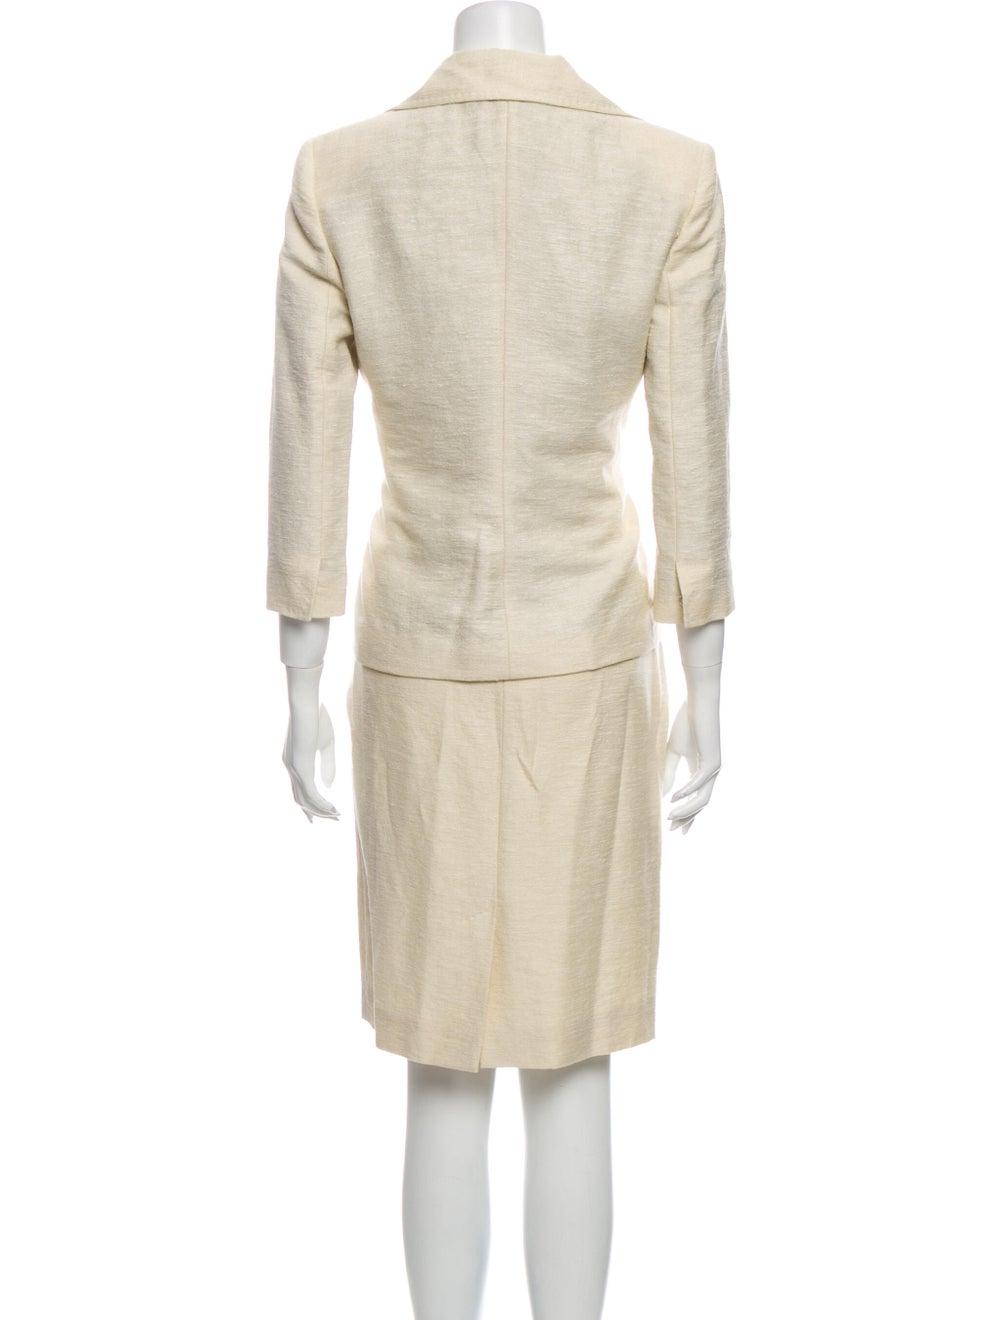 Dolce & Gabbana Linen Skirt Suit - image 3